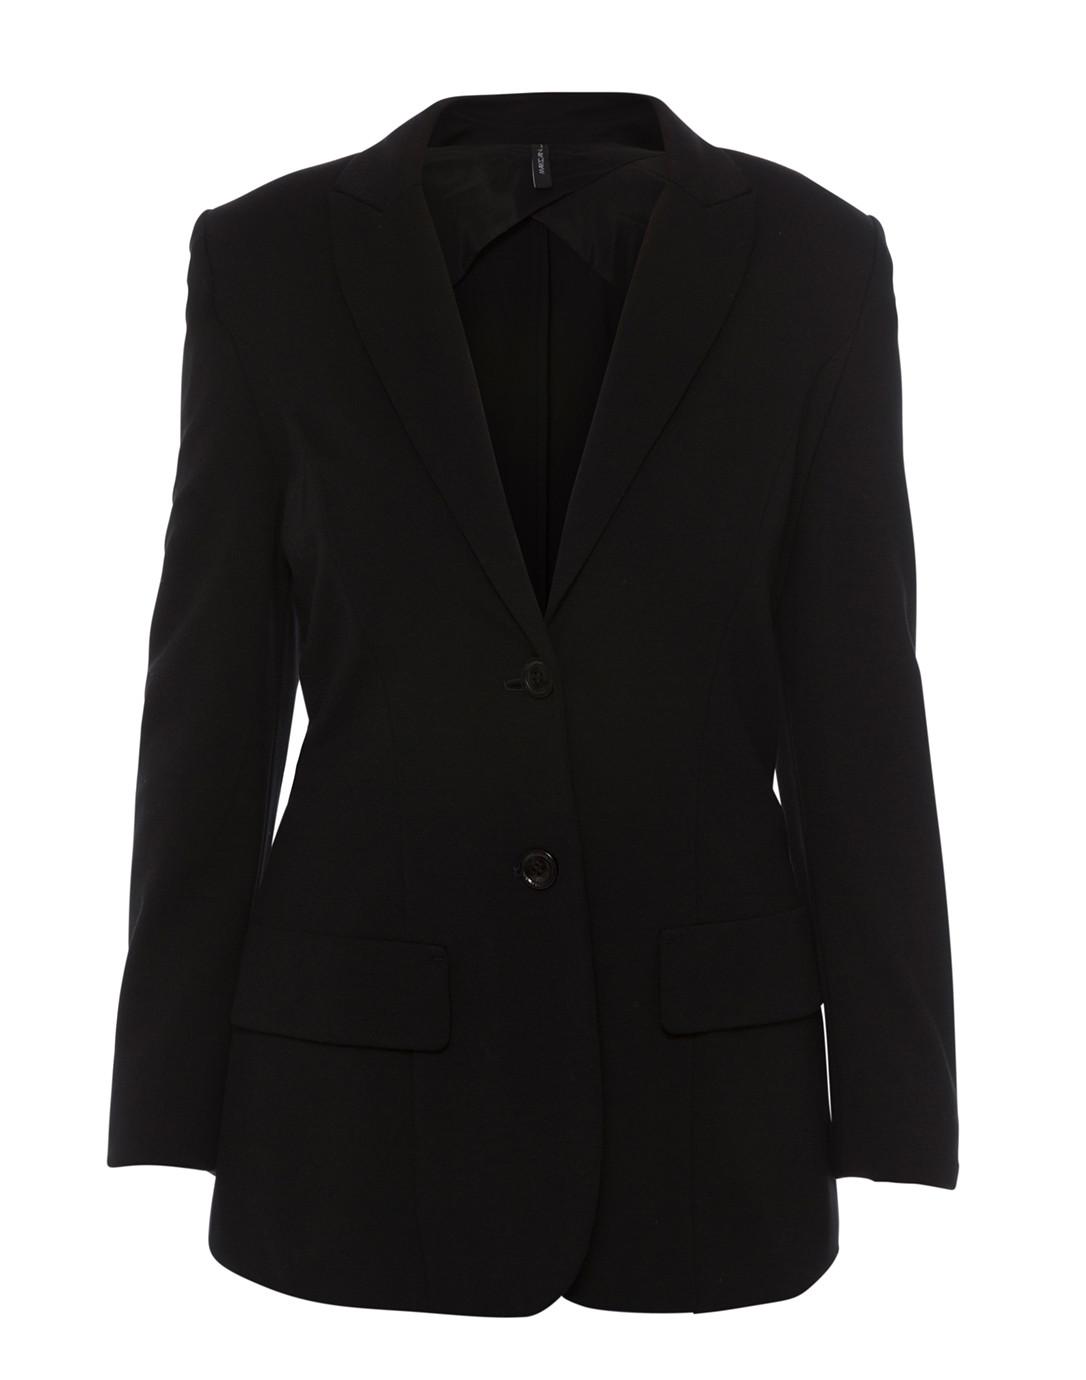 ff315b42 Black Jersey Knit Blazer